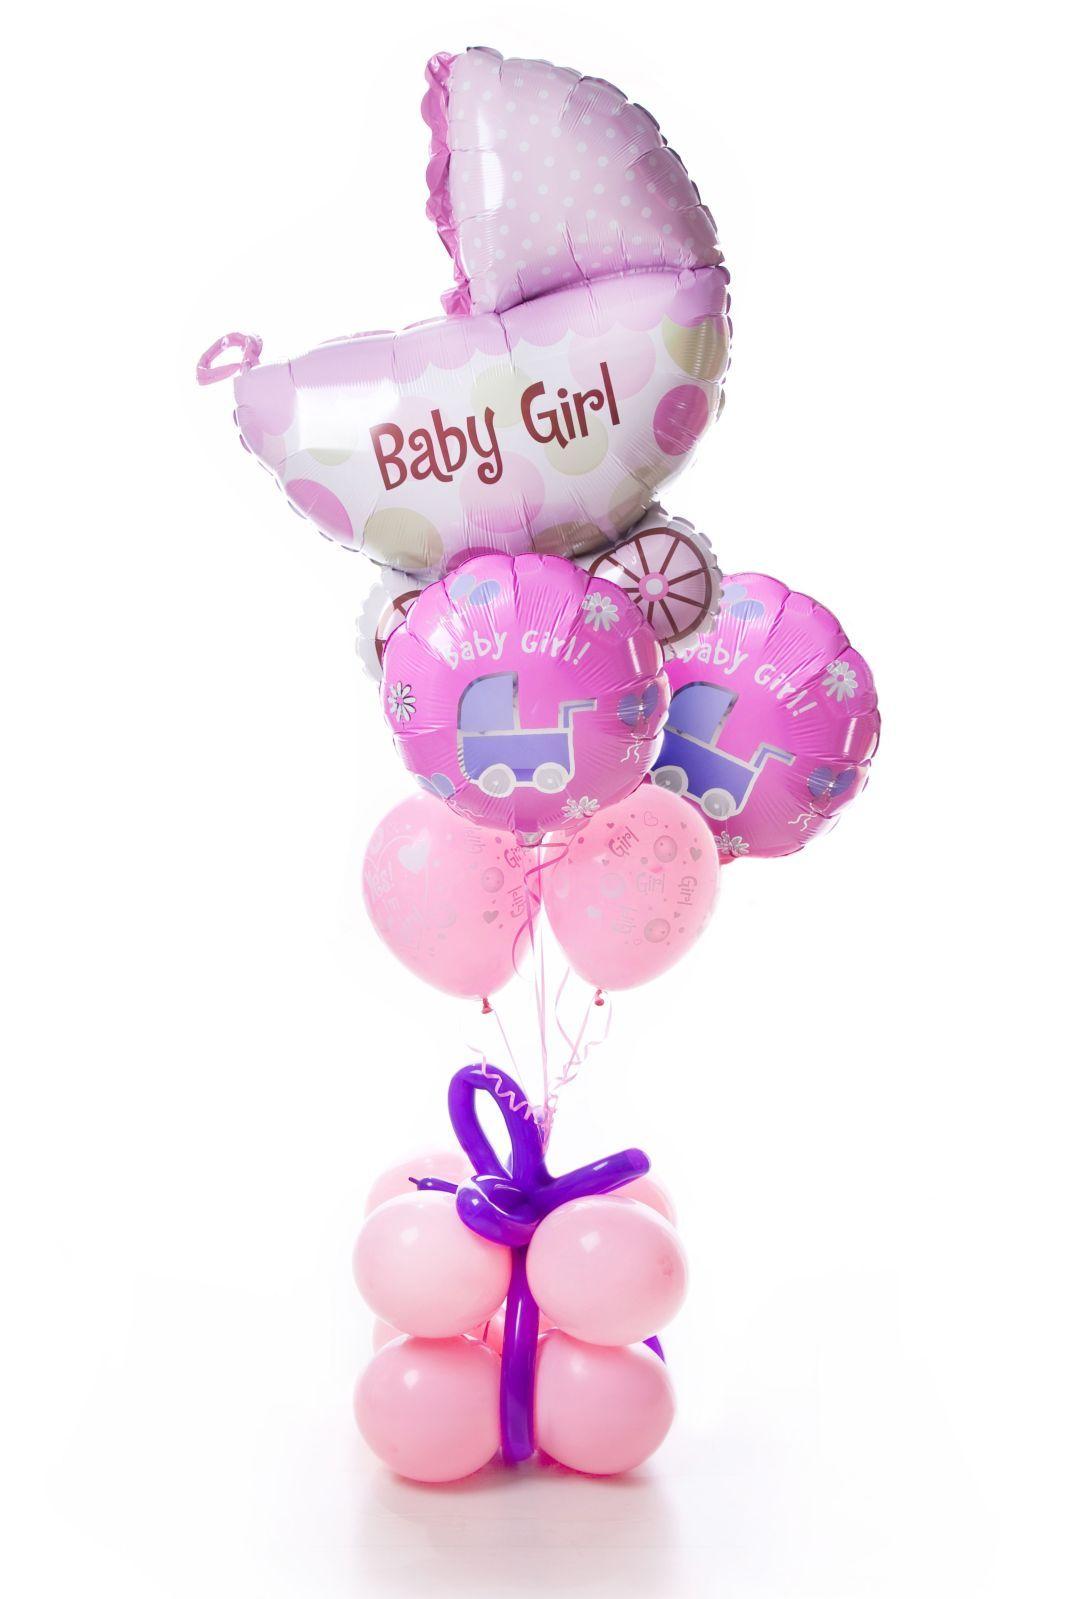 RockABaby! Balloon gift, Baby shower centerpieces